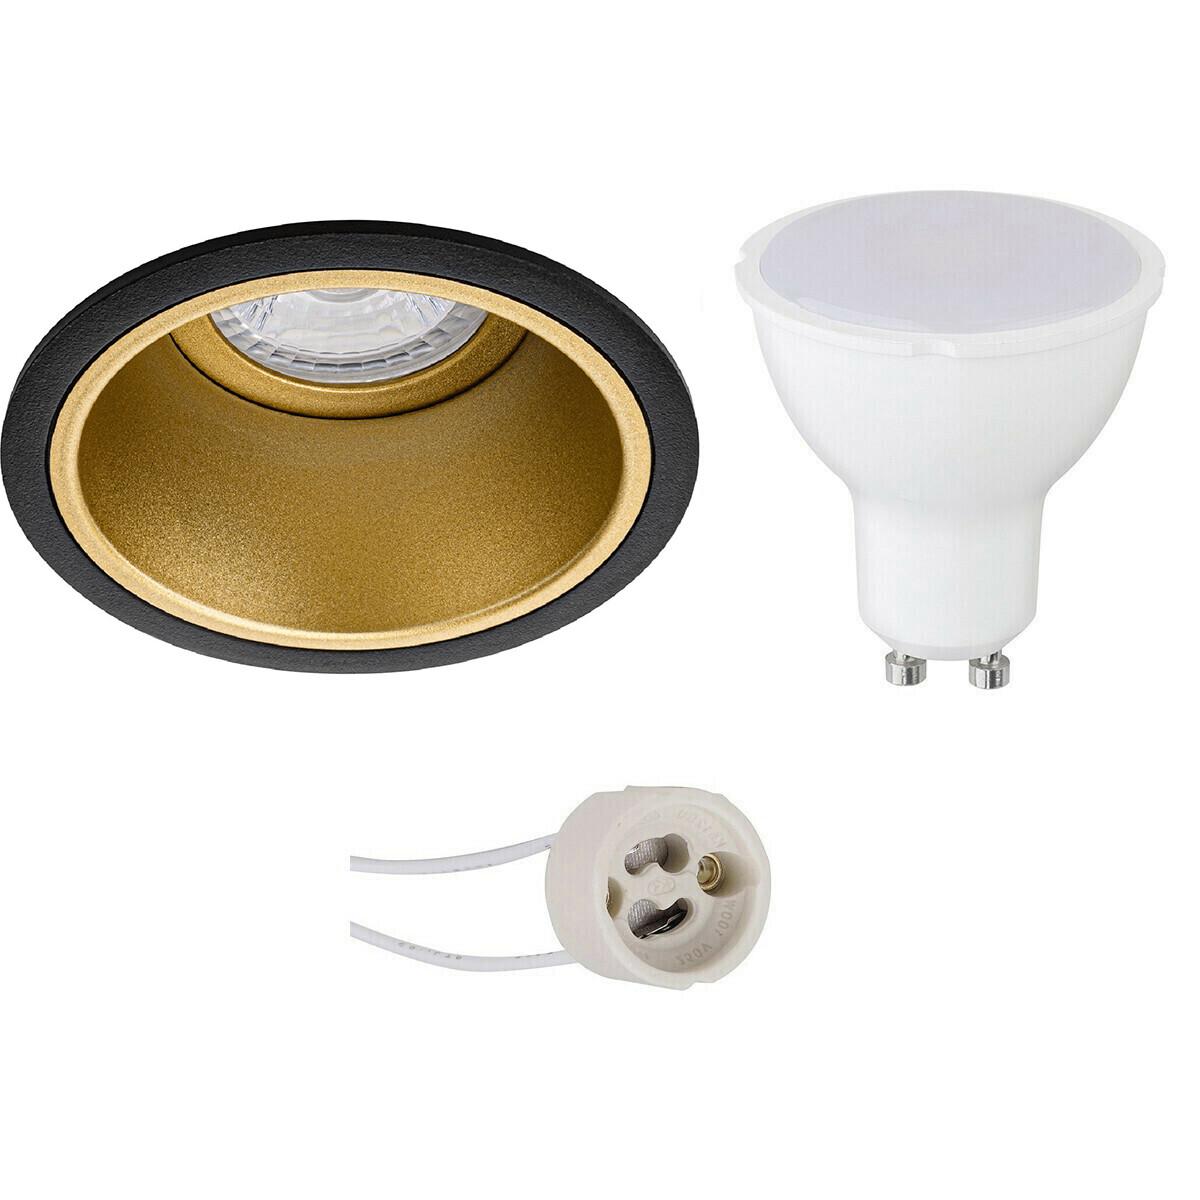 LED Spot Set - Pragmi Minko Pro - GU10 Fitting - Inbouw Rond - Mat Zwart/Goud - 4W - Natuurlijk Wit